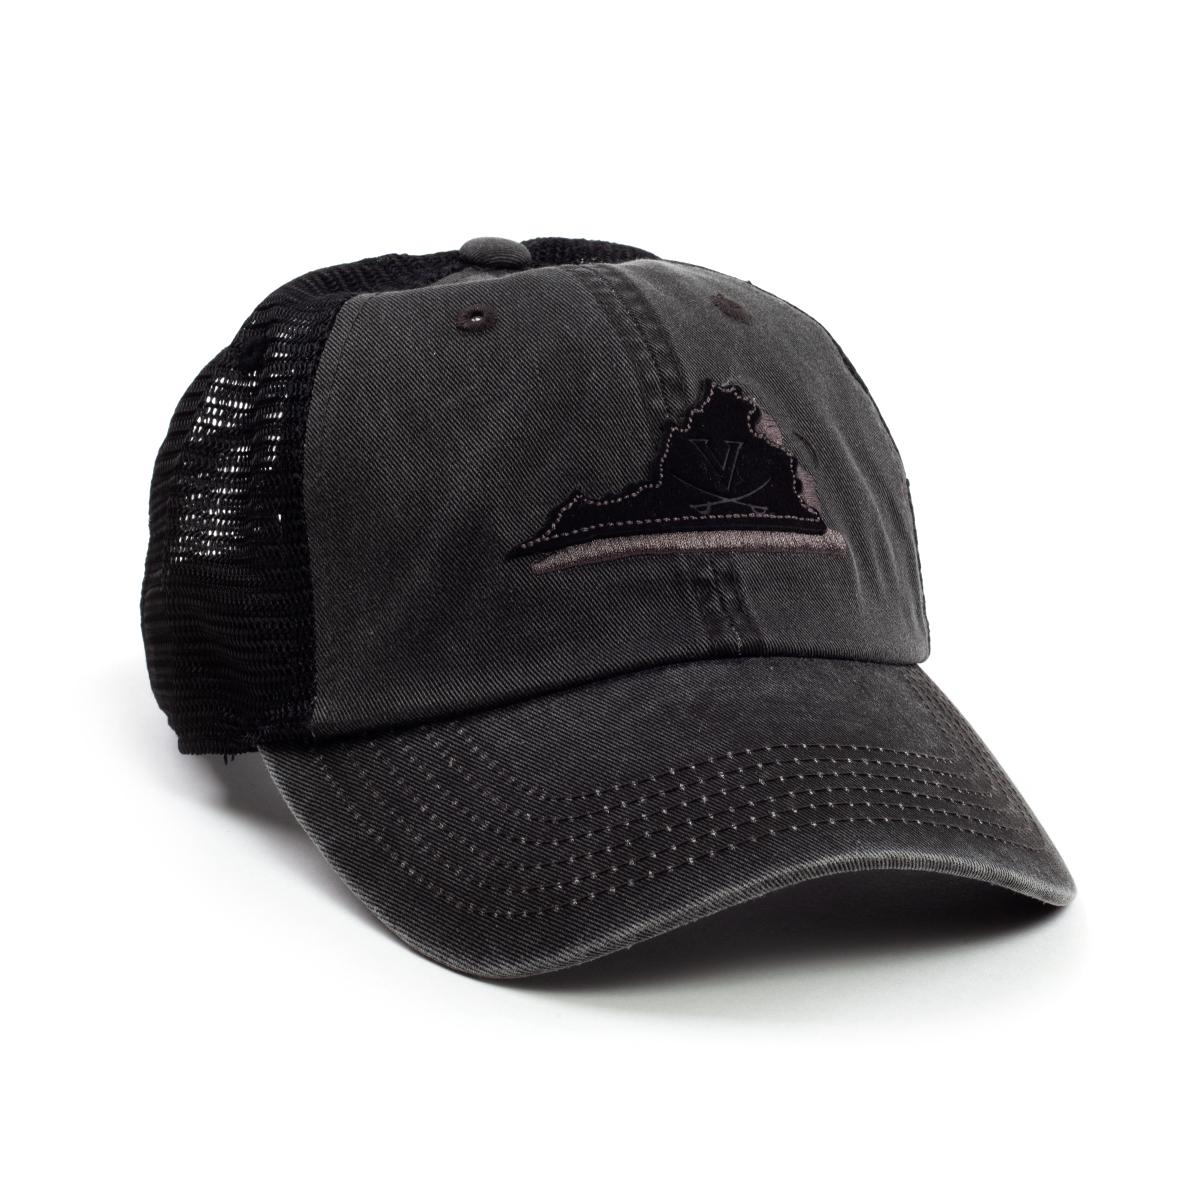 University of Virginia Black Adjustable Hat